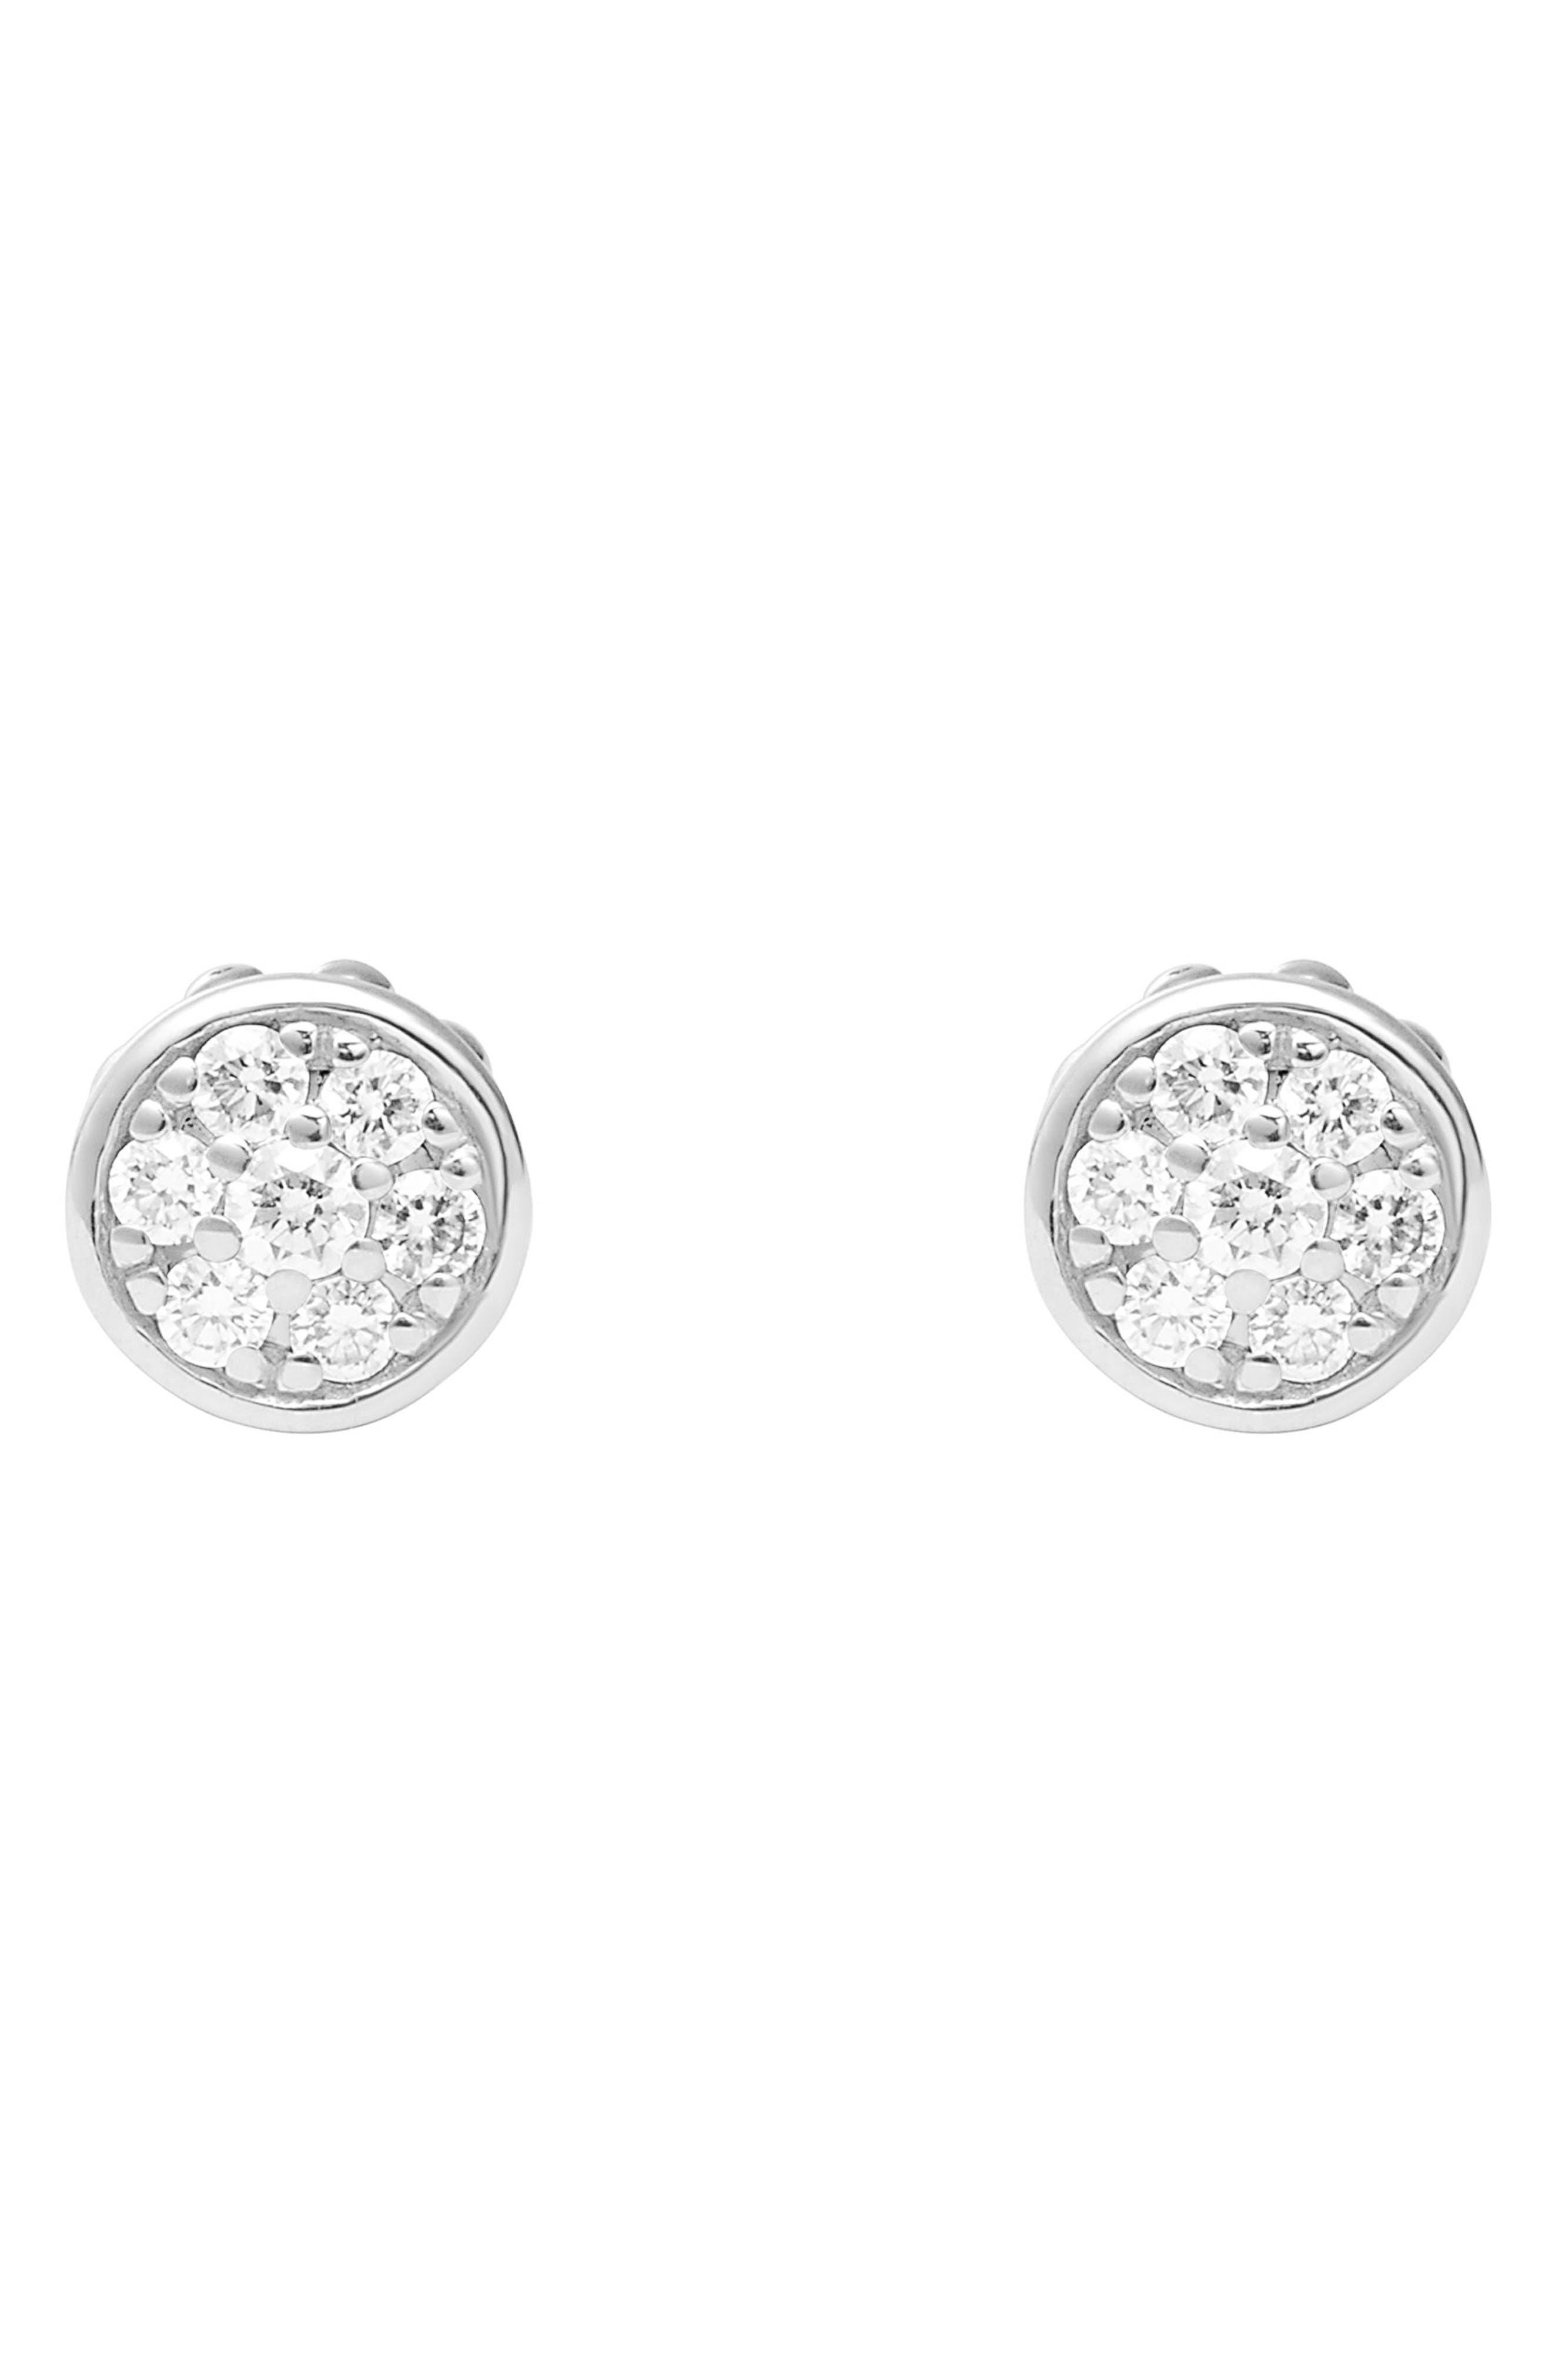 Diamond & Caviar Stud Earrings,                             Alternate thumbnail 2, color,                             040